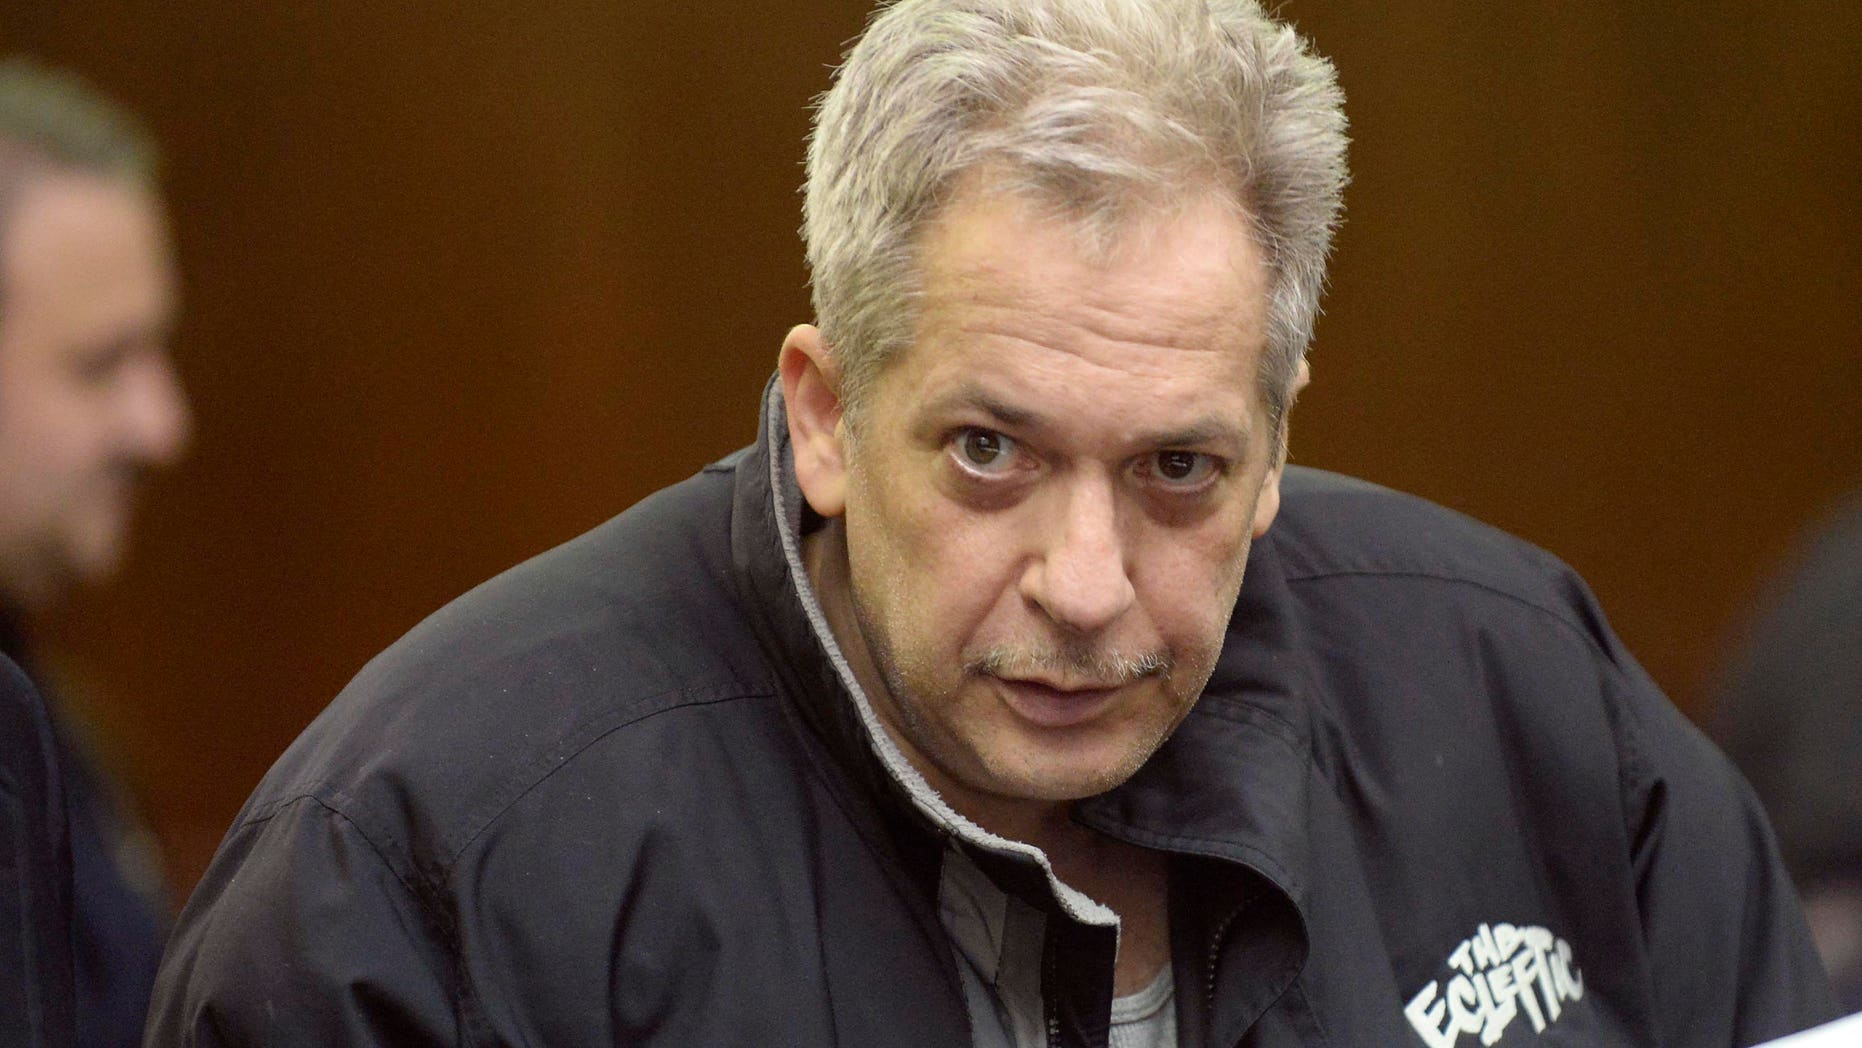 Hoffman's alleged drug dealer says he's a 'scapegoat' | Fox News